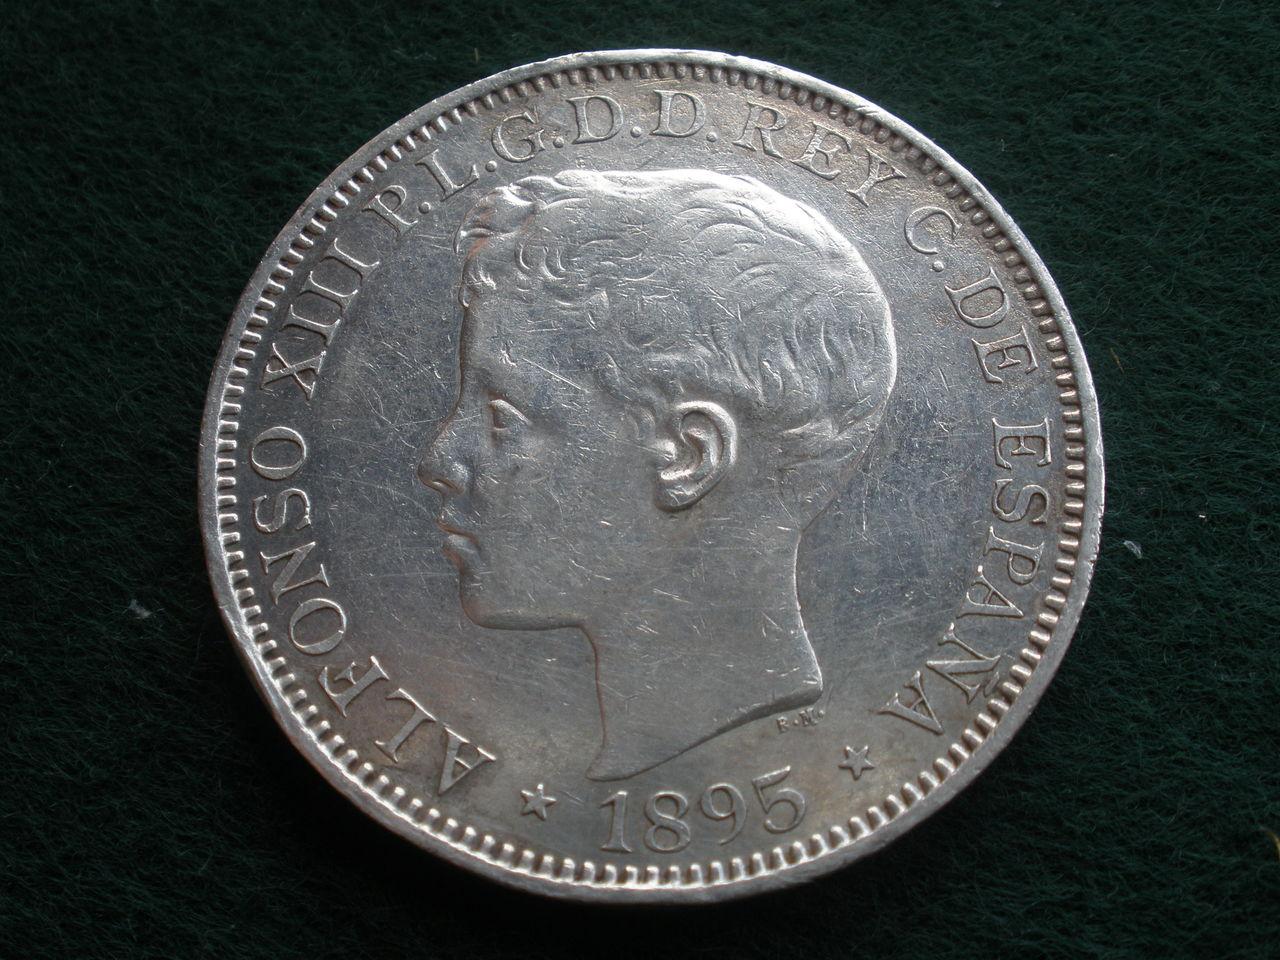 1895. Alfonso XIII 1 peso Puerto Rico P1010199